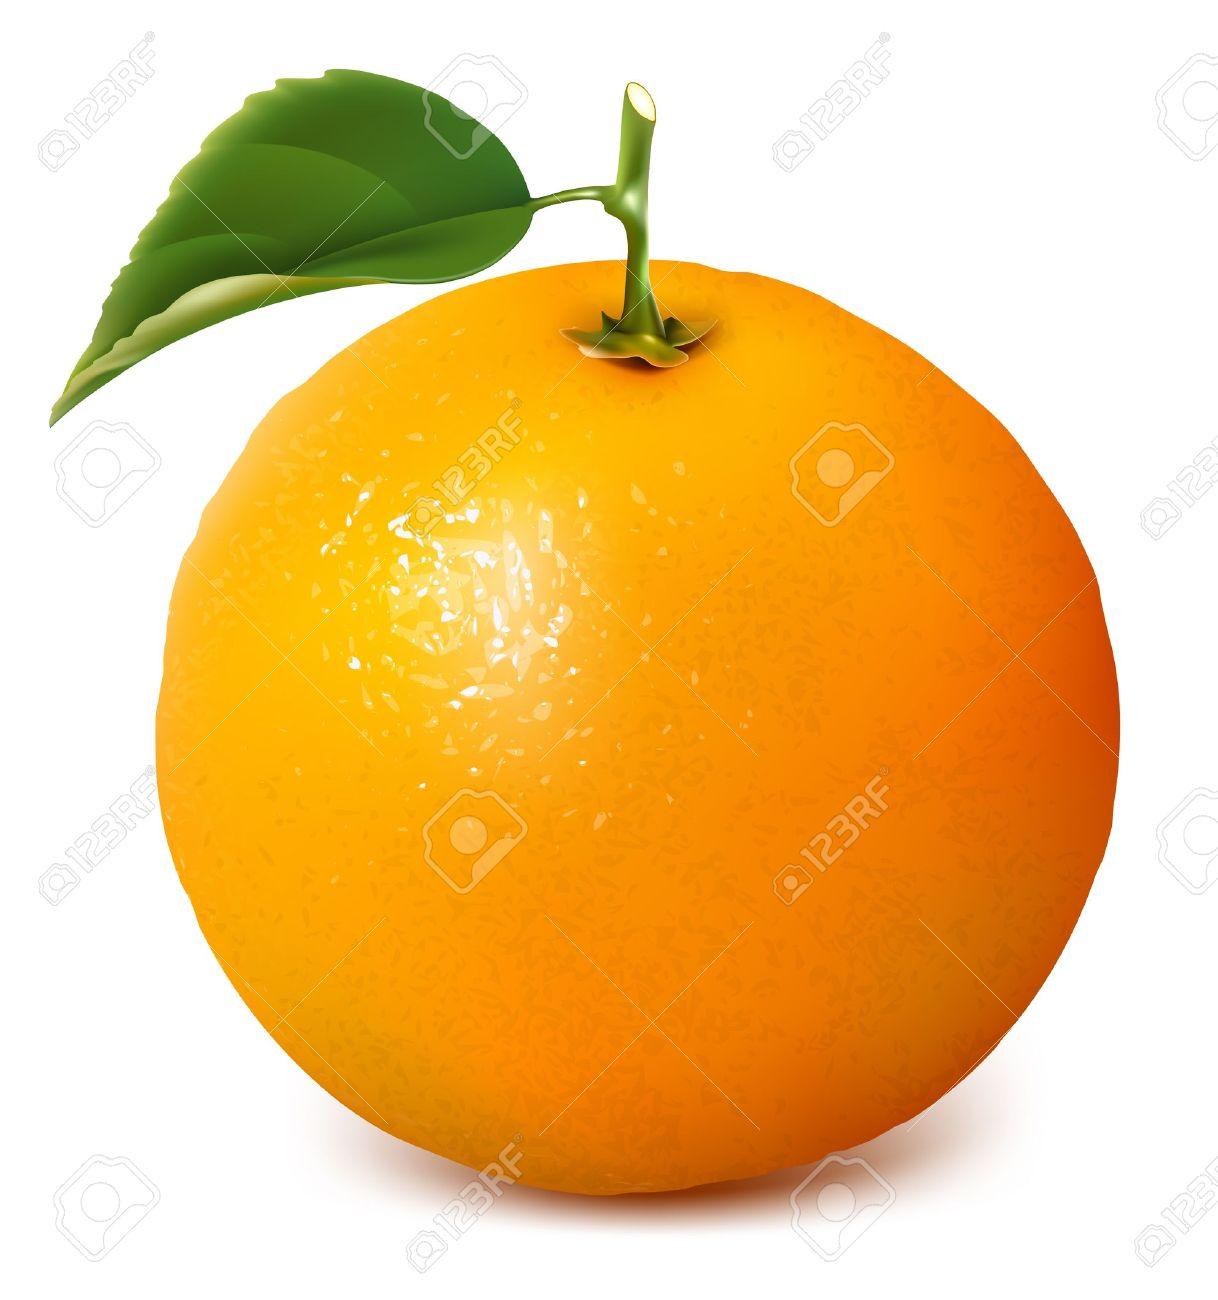 Vector fresh ripe orange with leaf. Stock Vector - 9900137